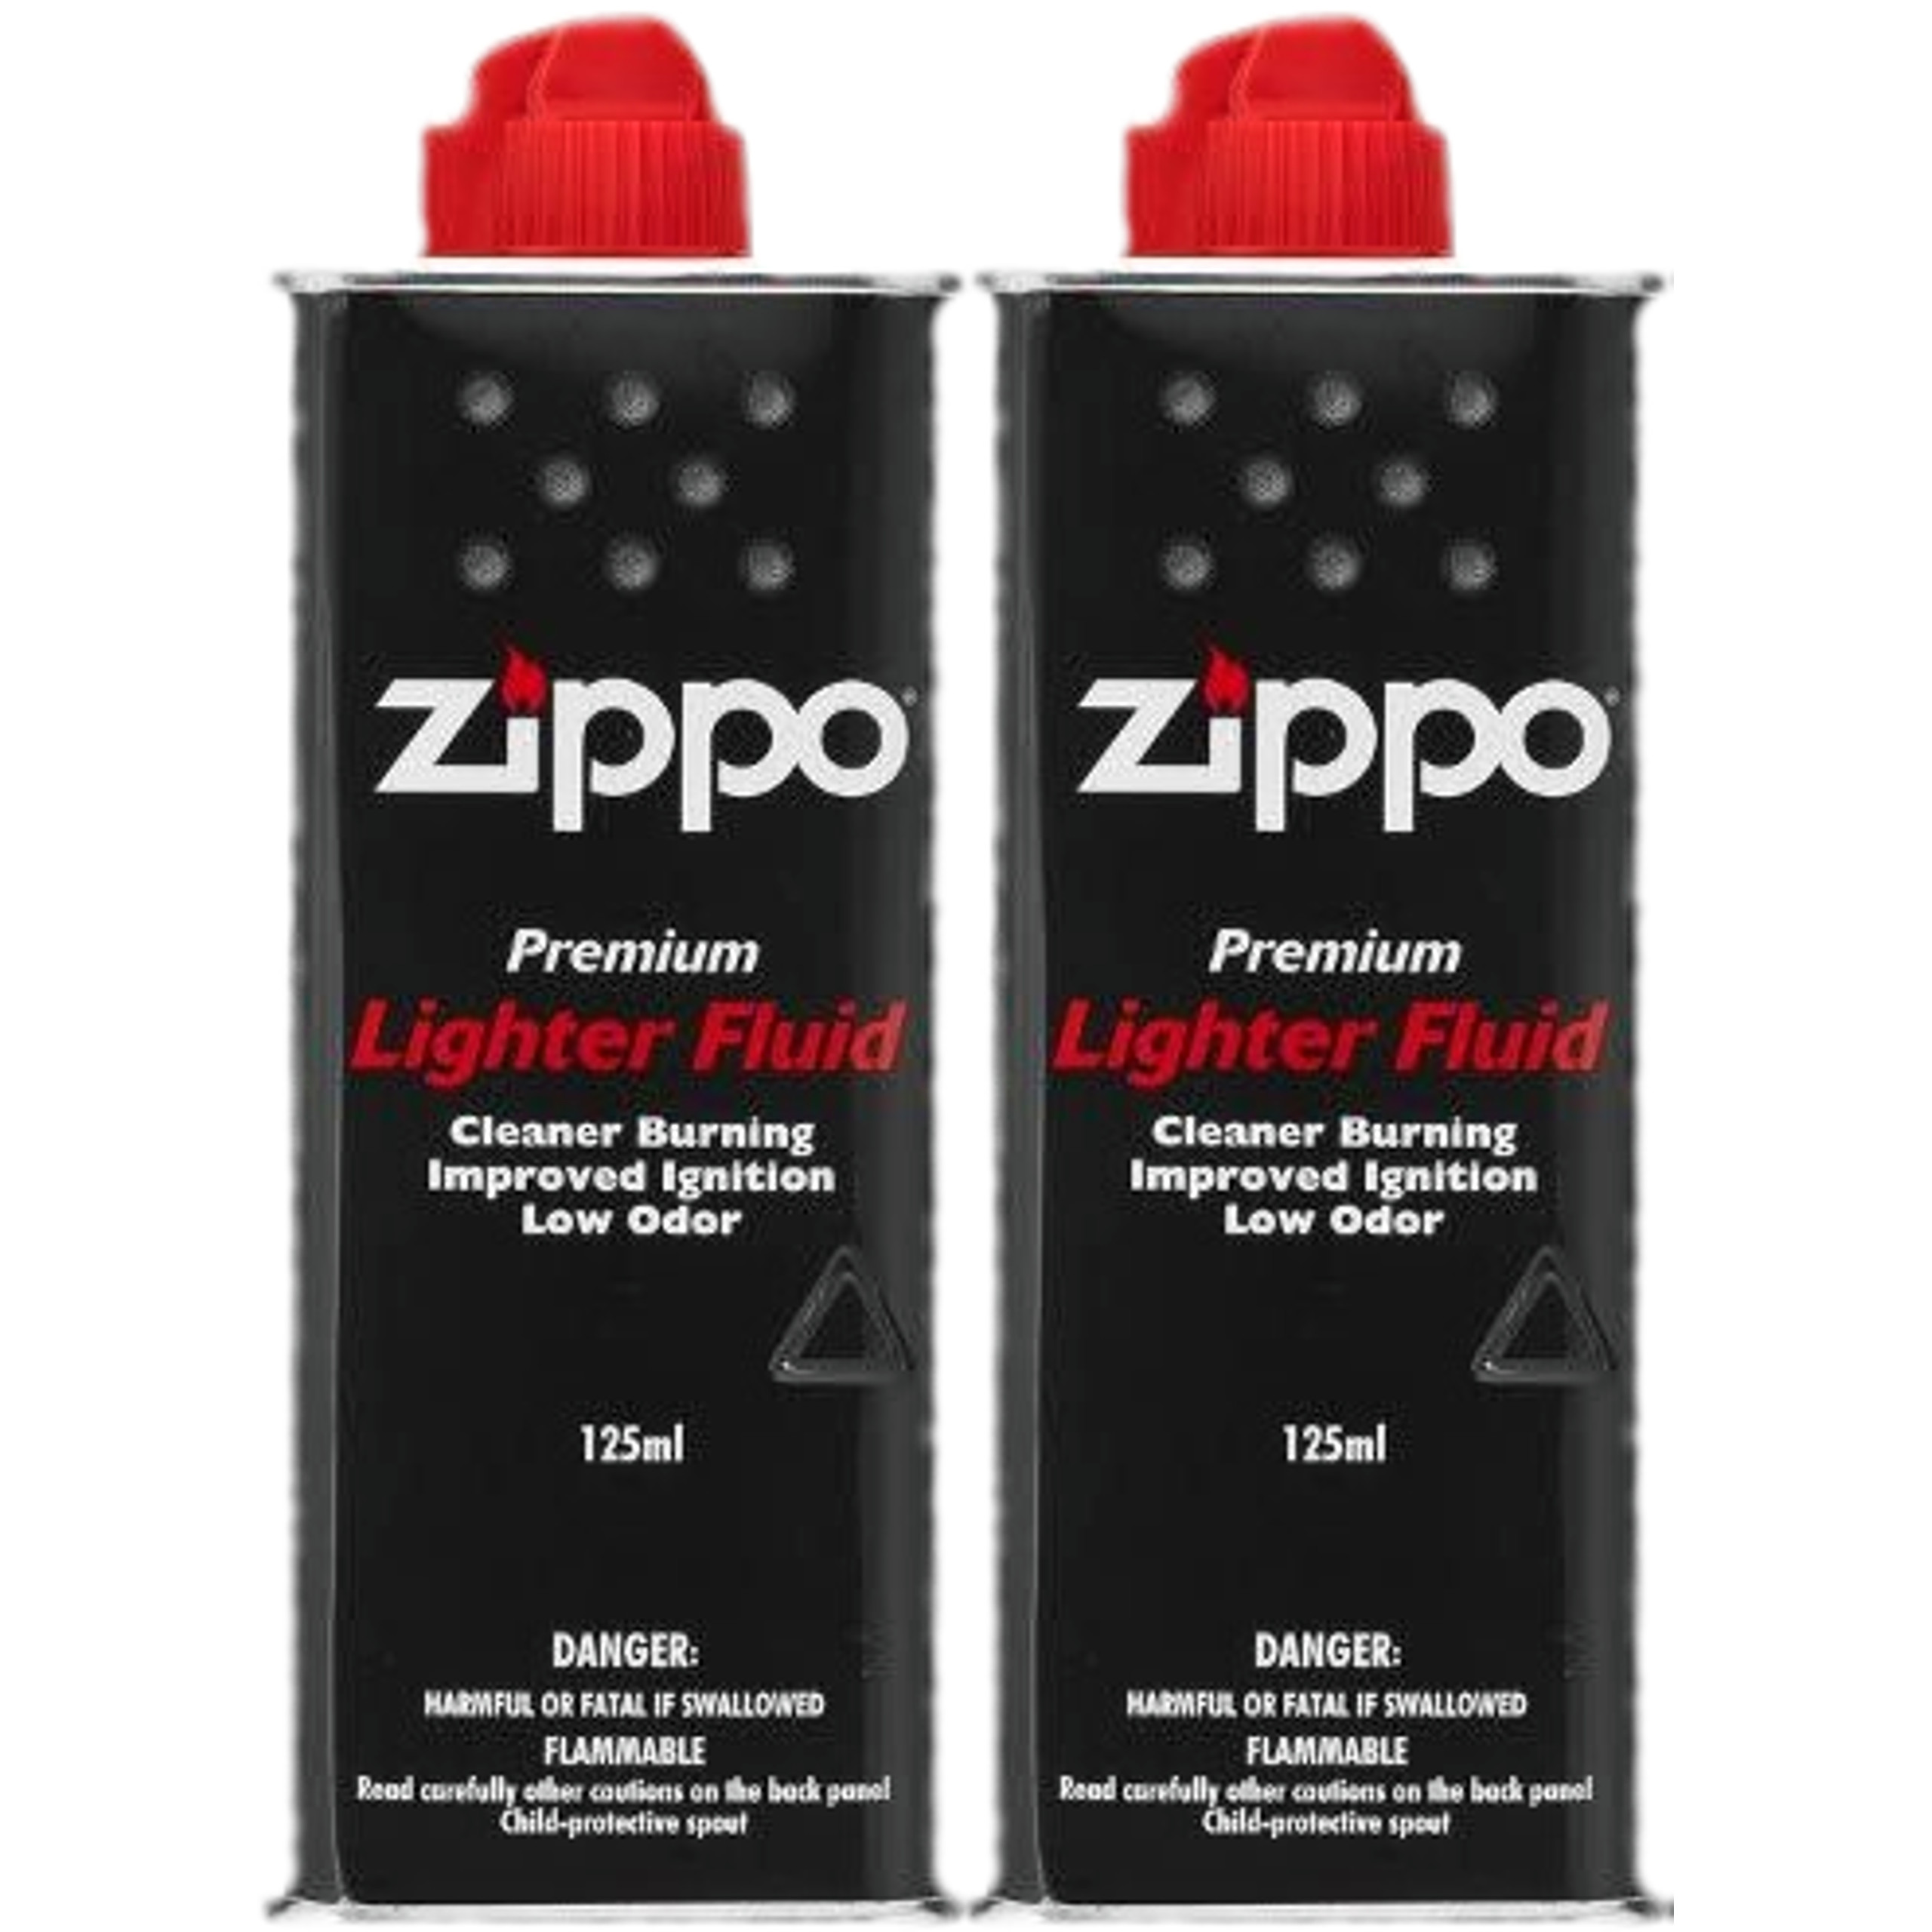 2x Бензин ZIPPO 125ml для зажигалок бензиновых двигателей